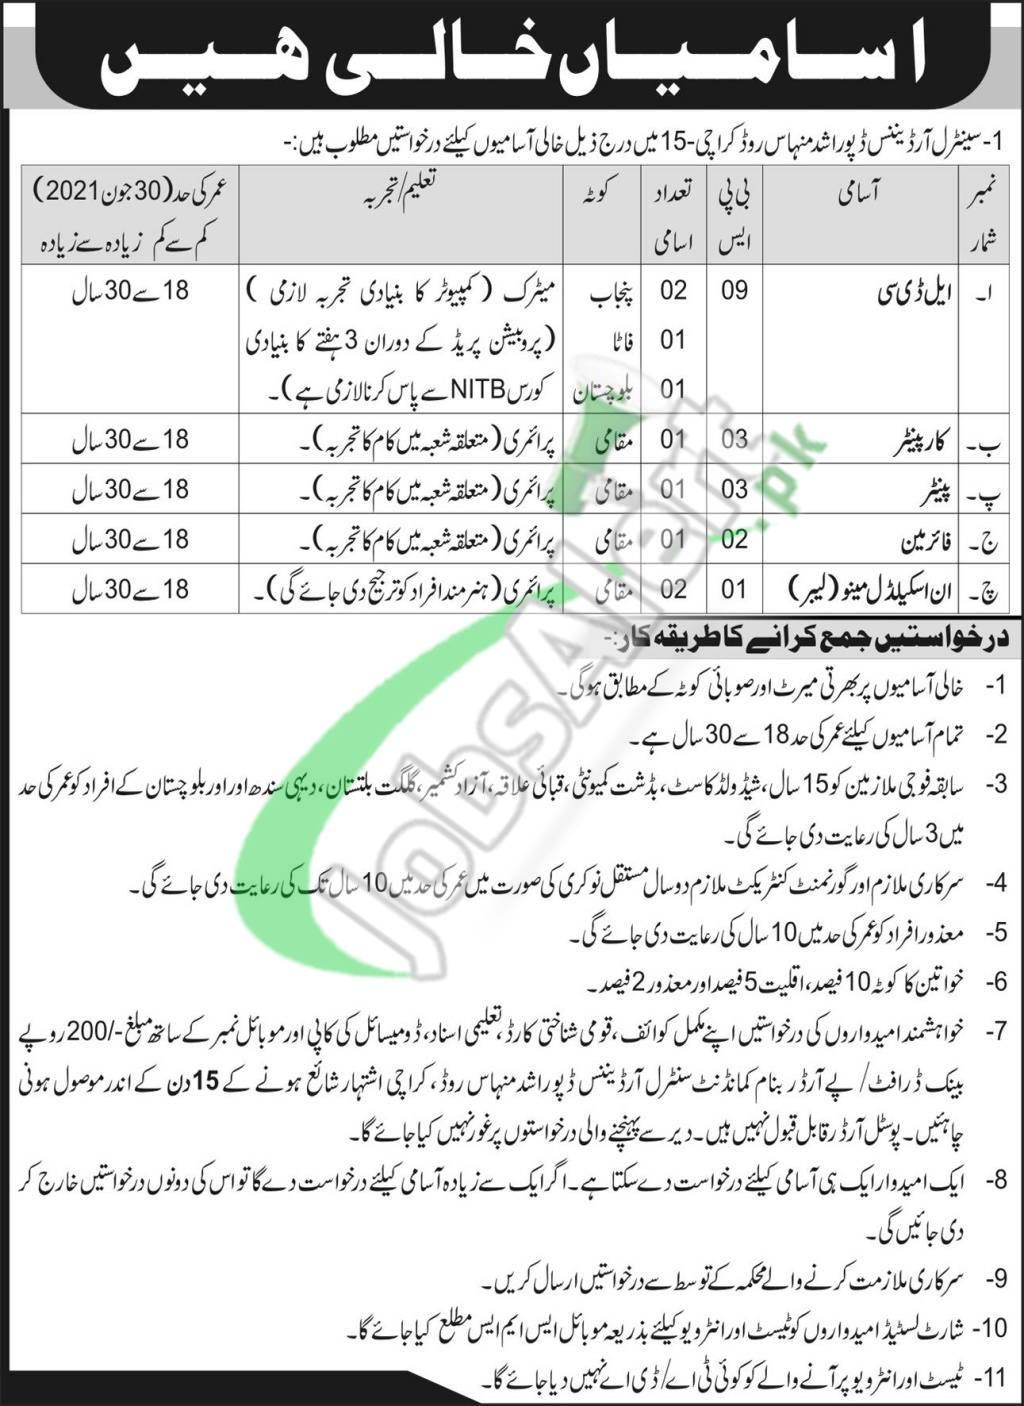 Central Ordnance Depot Karachi Jobs 2021